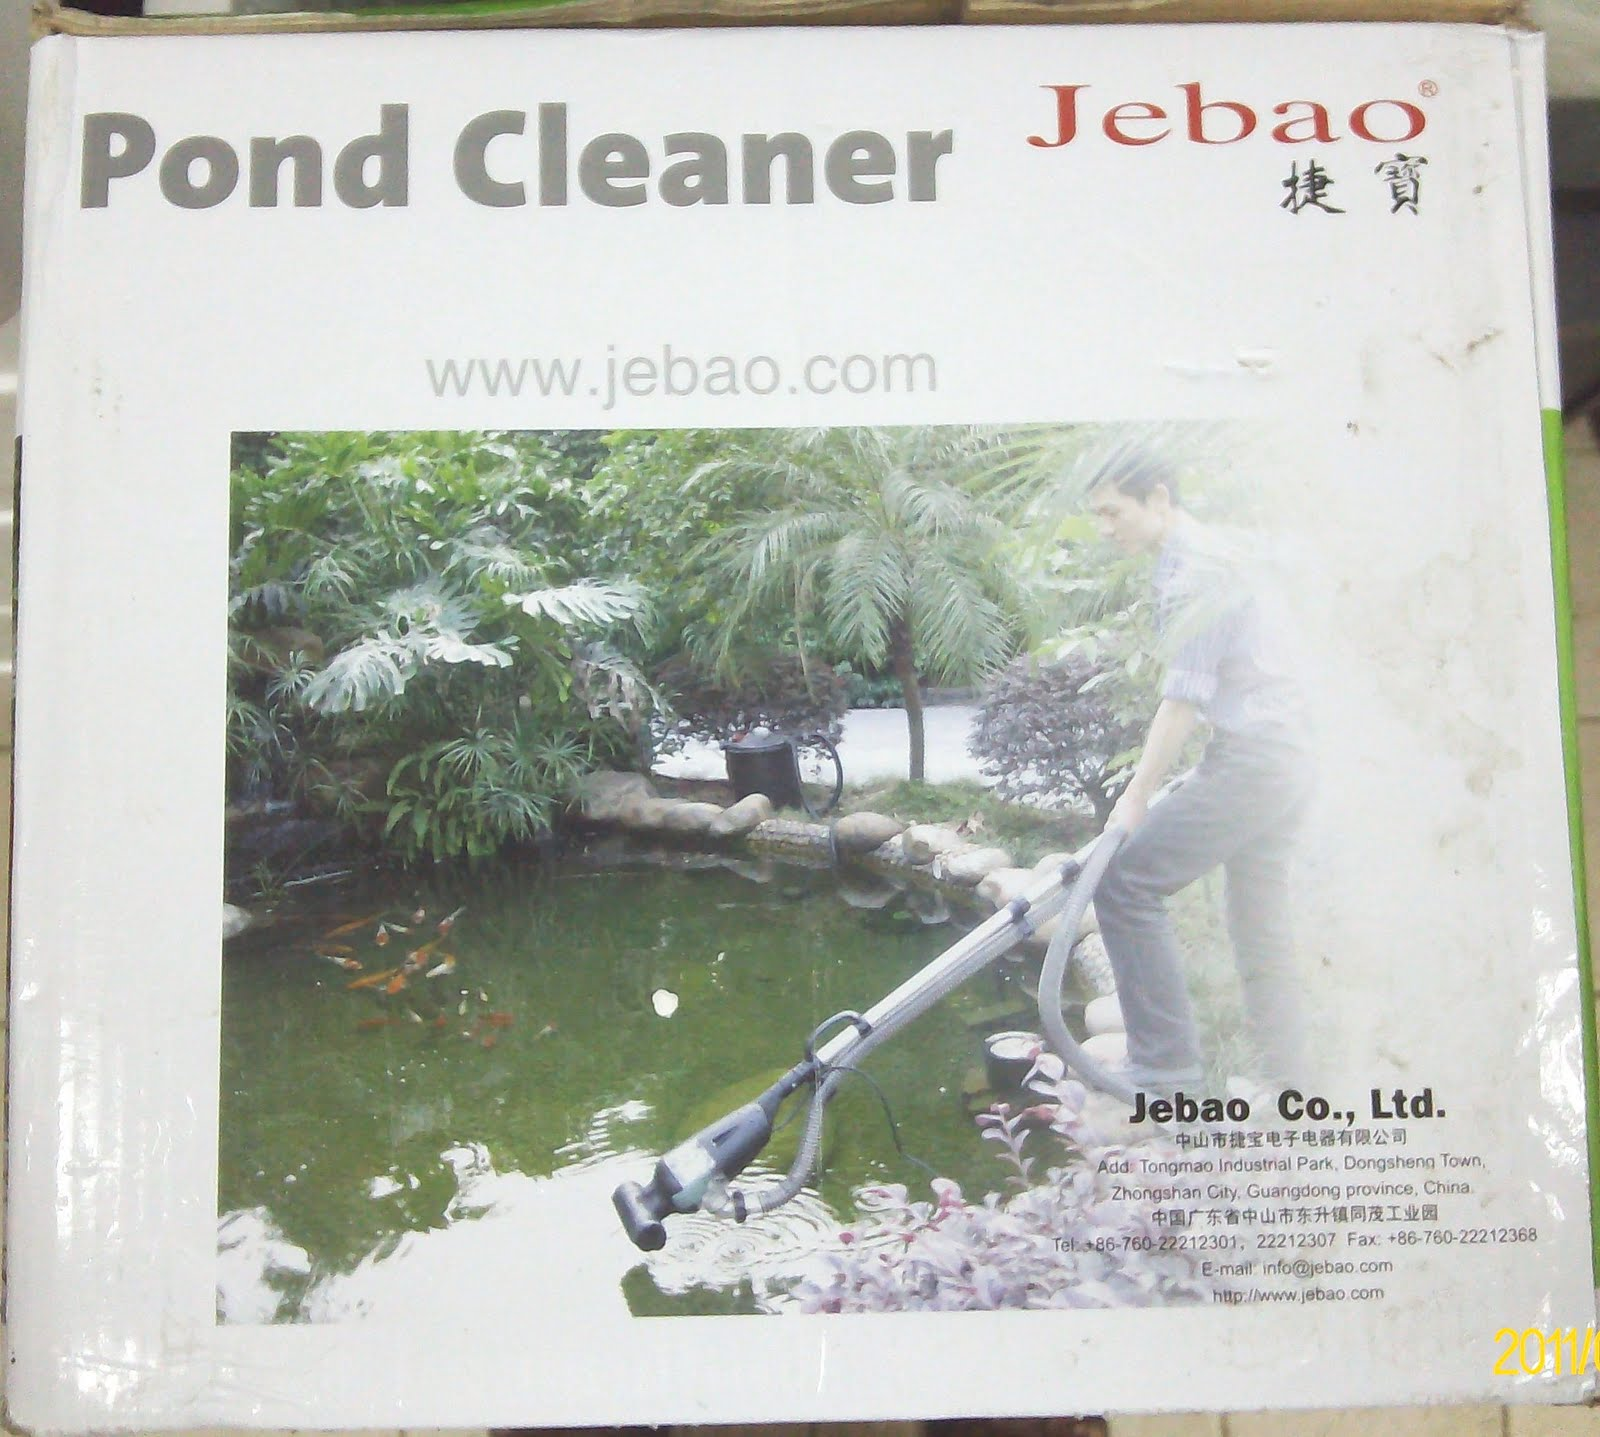 Hong kong aquarium supply hkfish2008 jebao pond cleaner for Pond cleaner